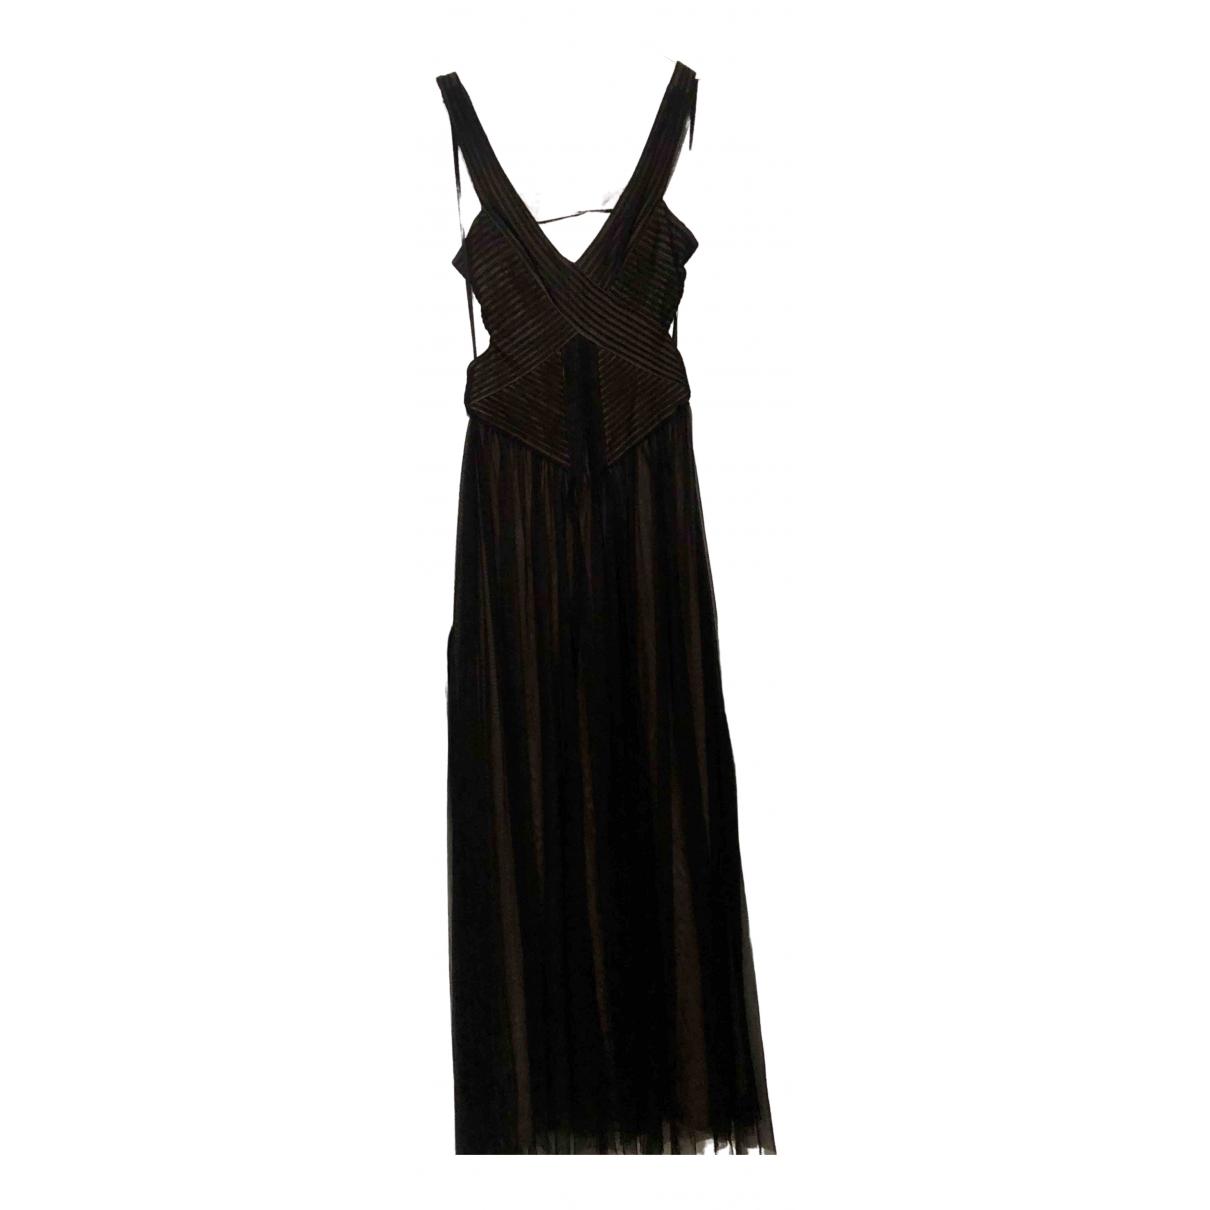 Bcbg Max Azria \N Black dress for Women 8 US